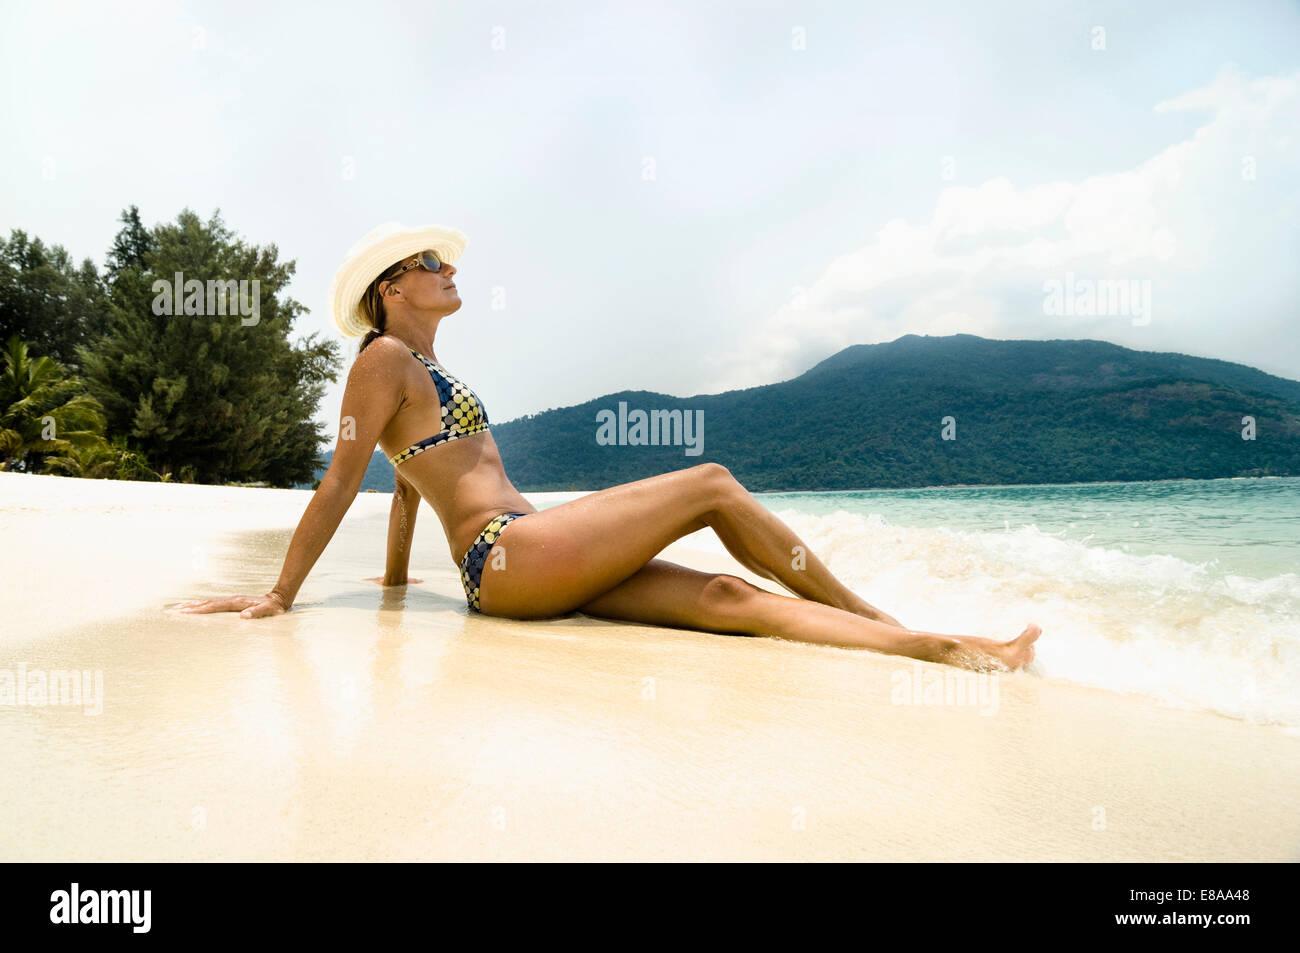 woman sitting on the beach, Koh Lipe, Thailand - Stock Image